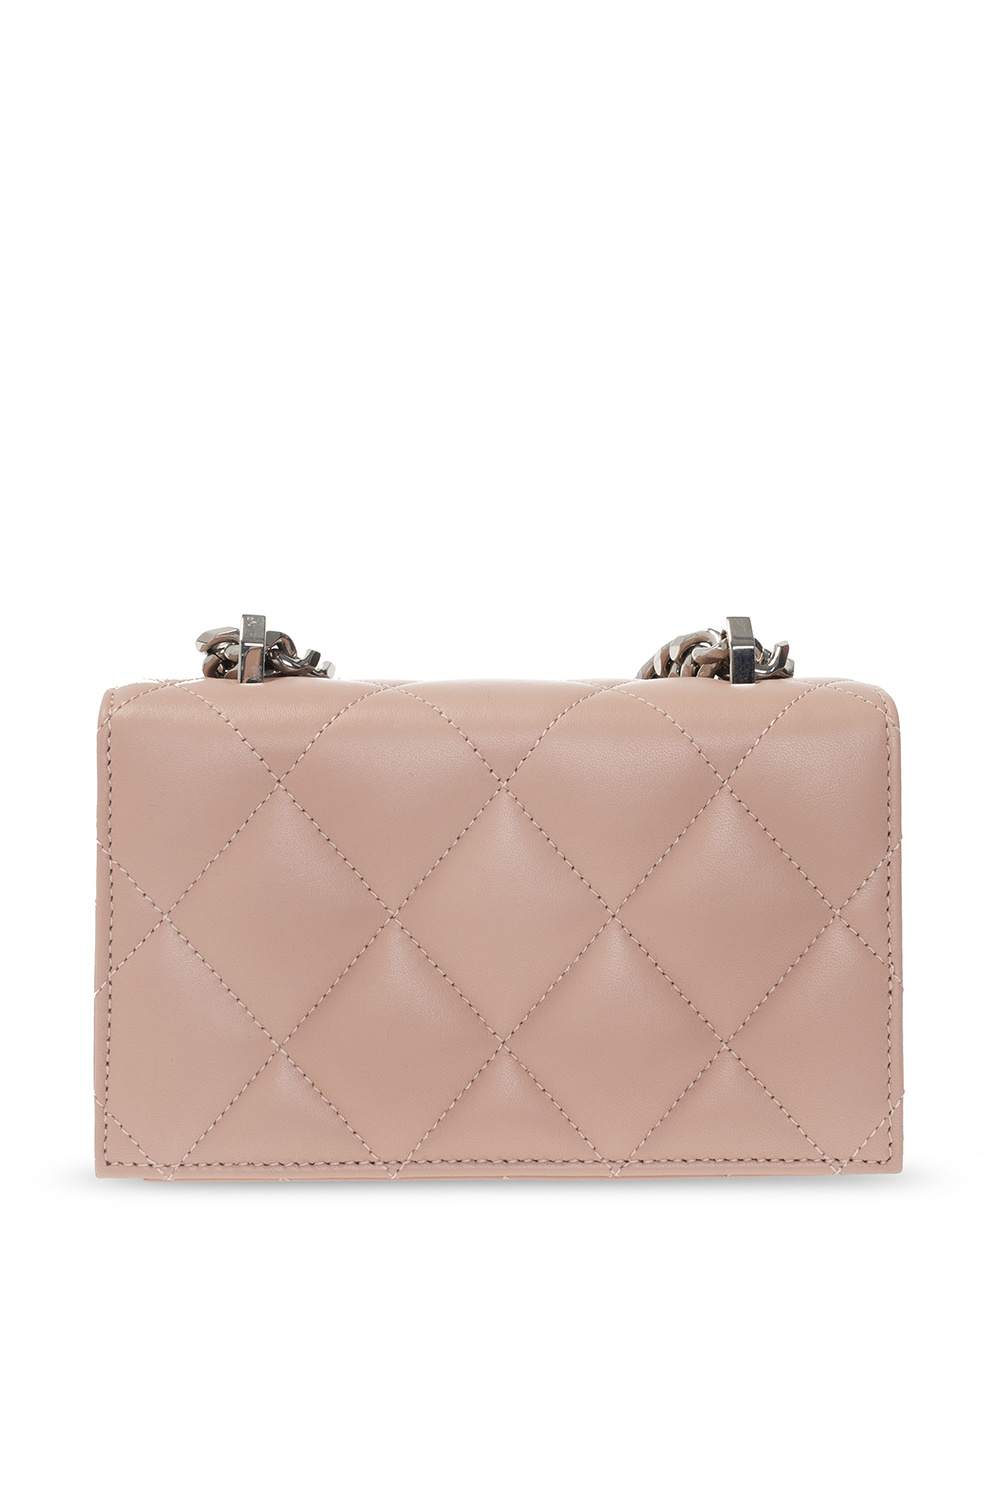 Alexander McQueen 'The Curve' shoulder bag